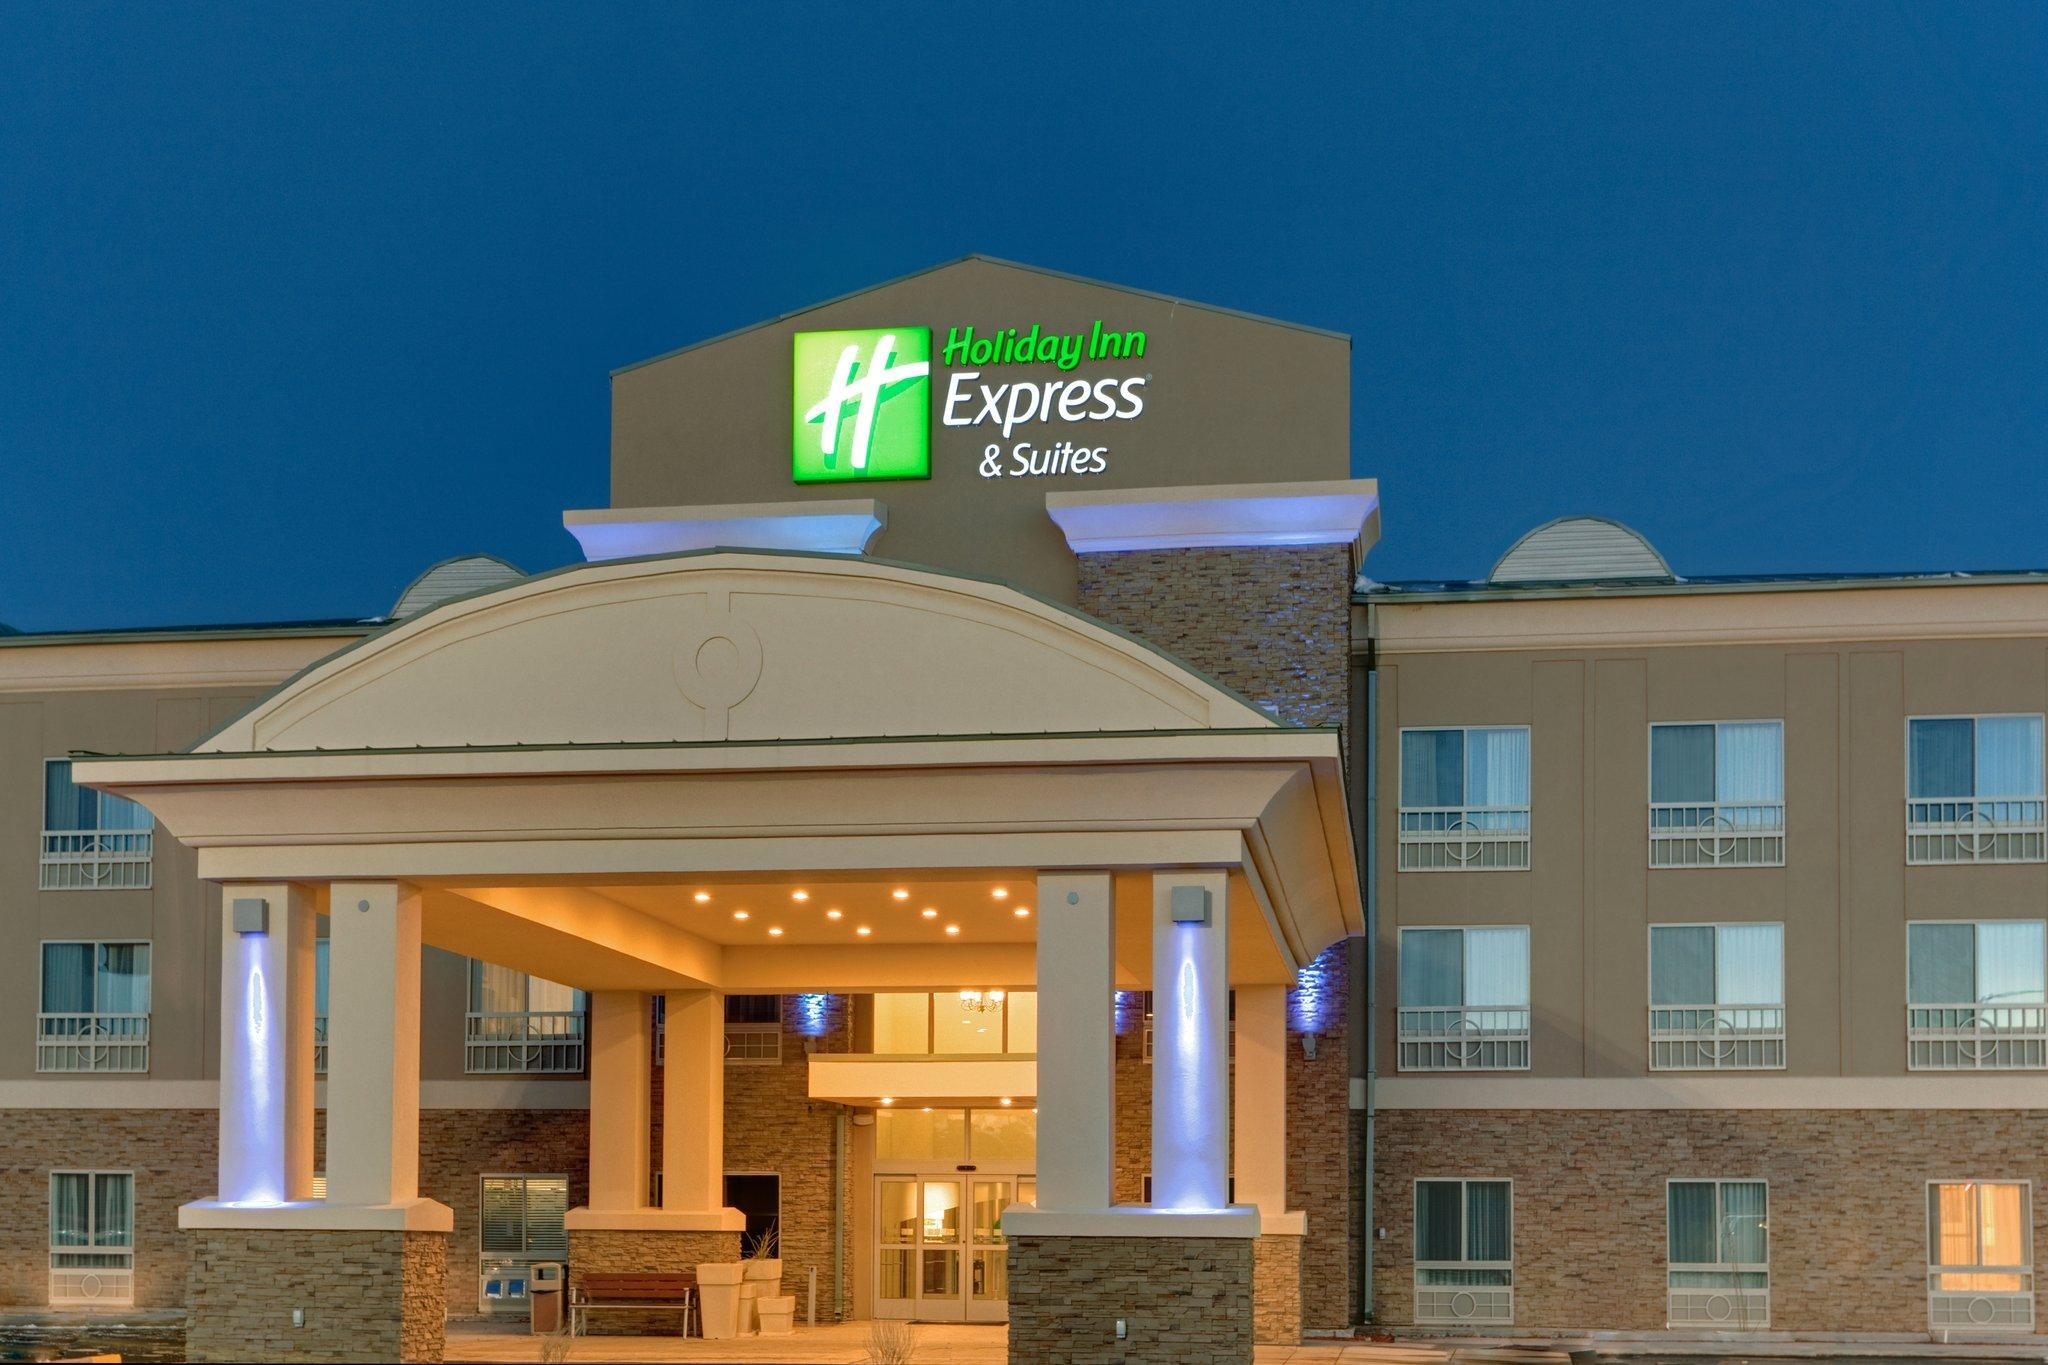 Holiday Inn Express Hotel & Suites Grants Milan